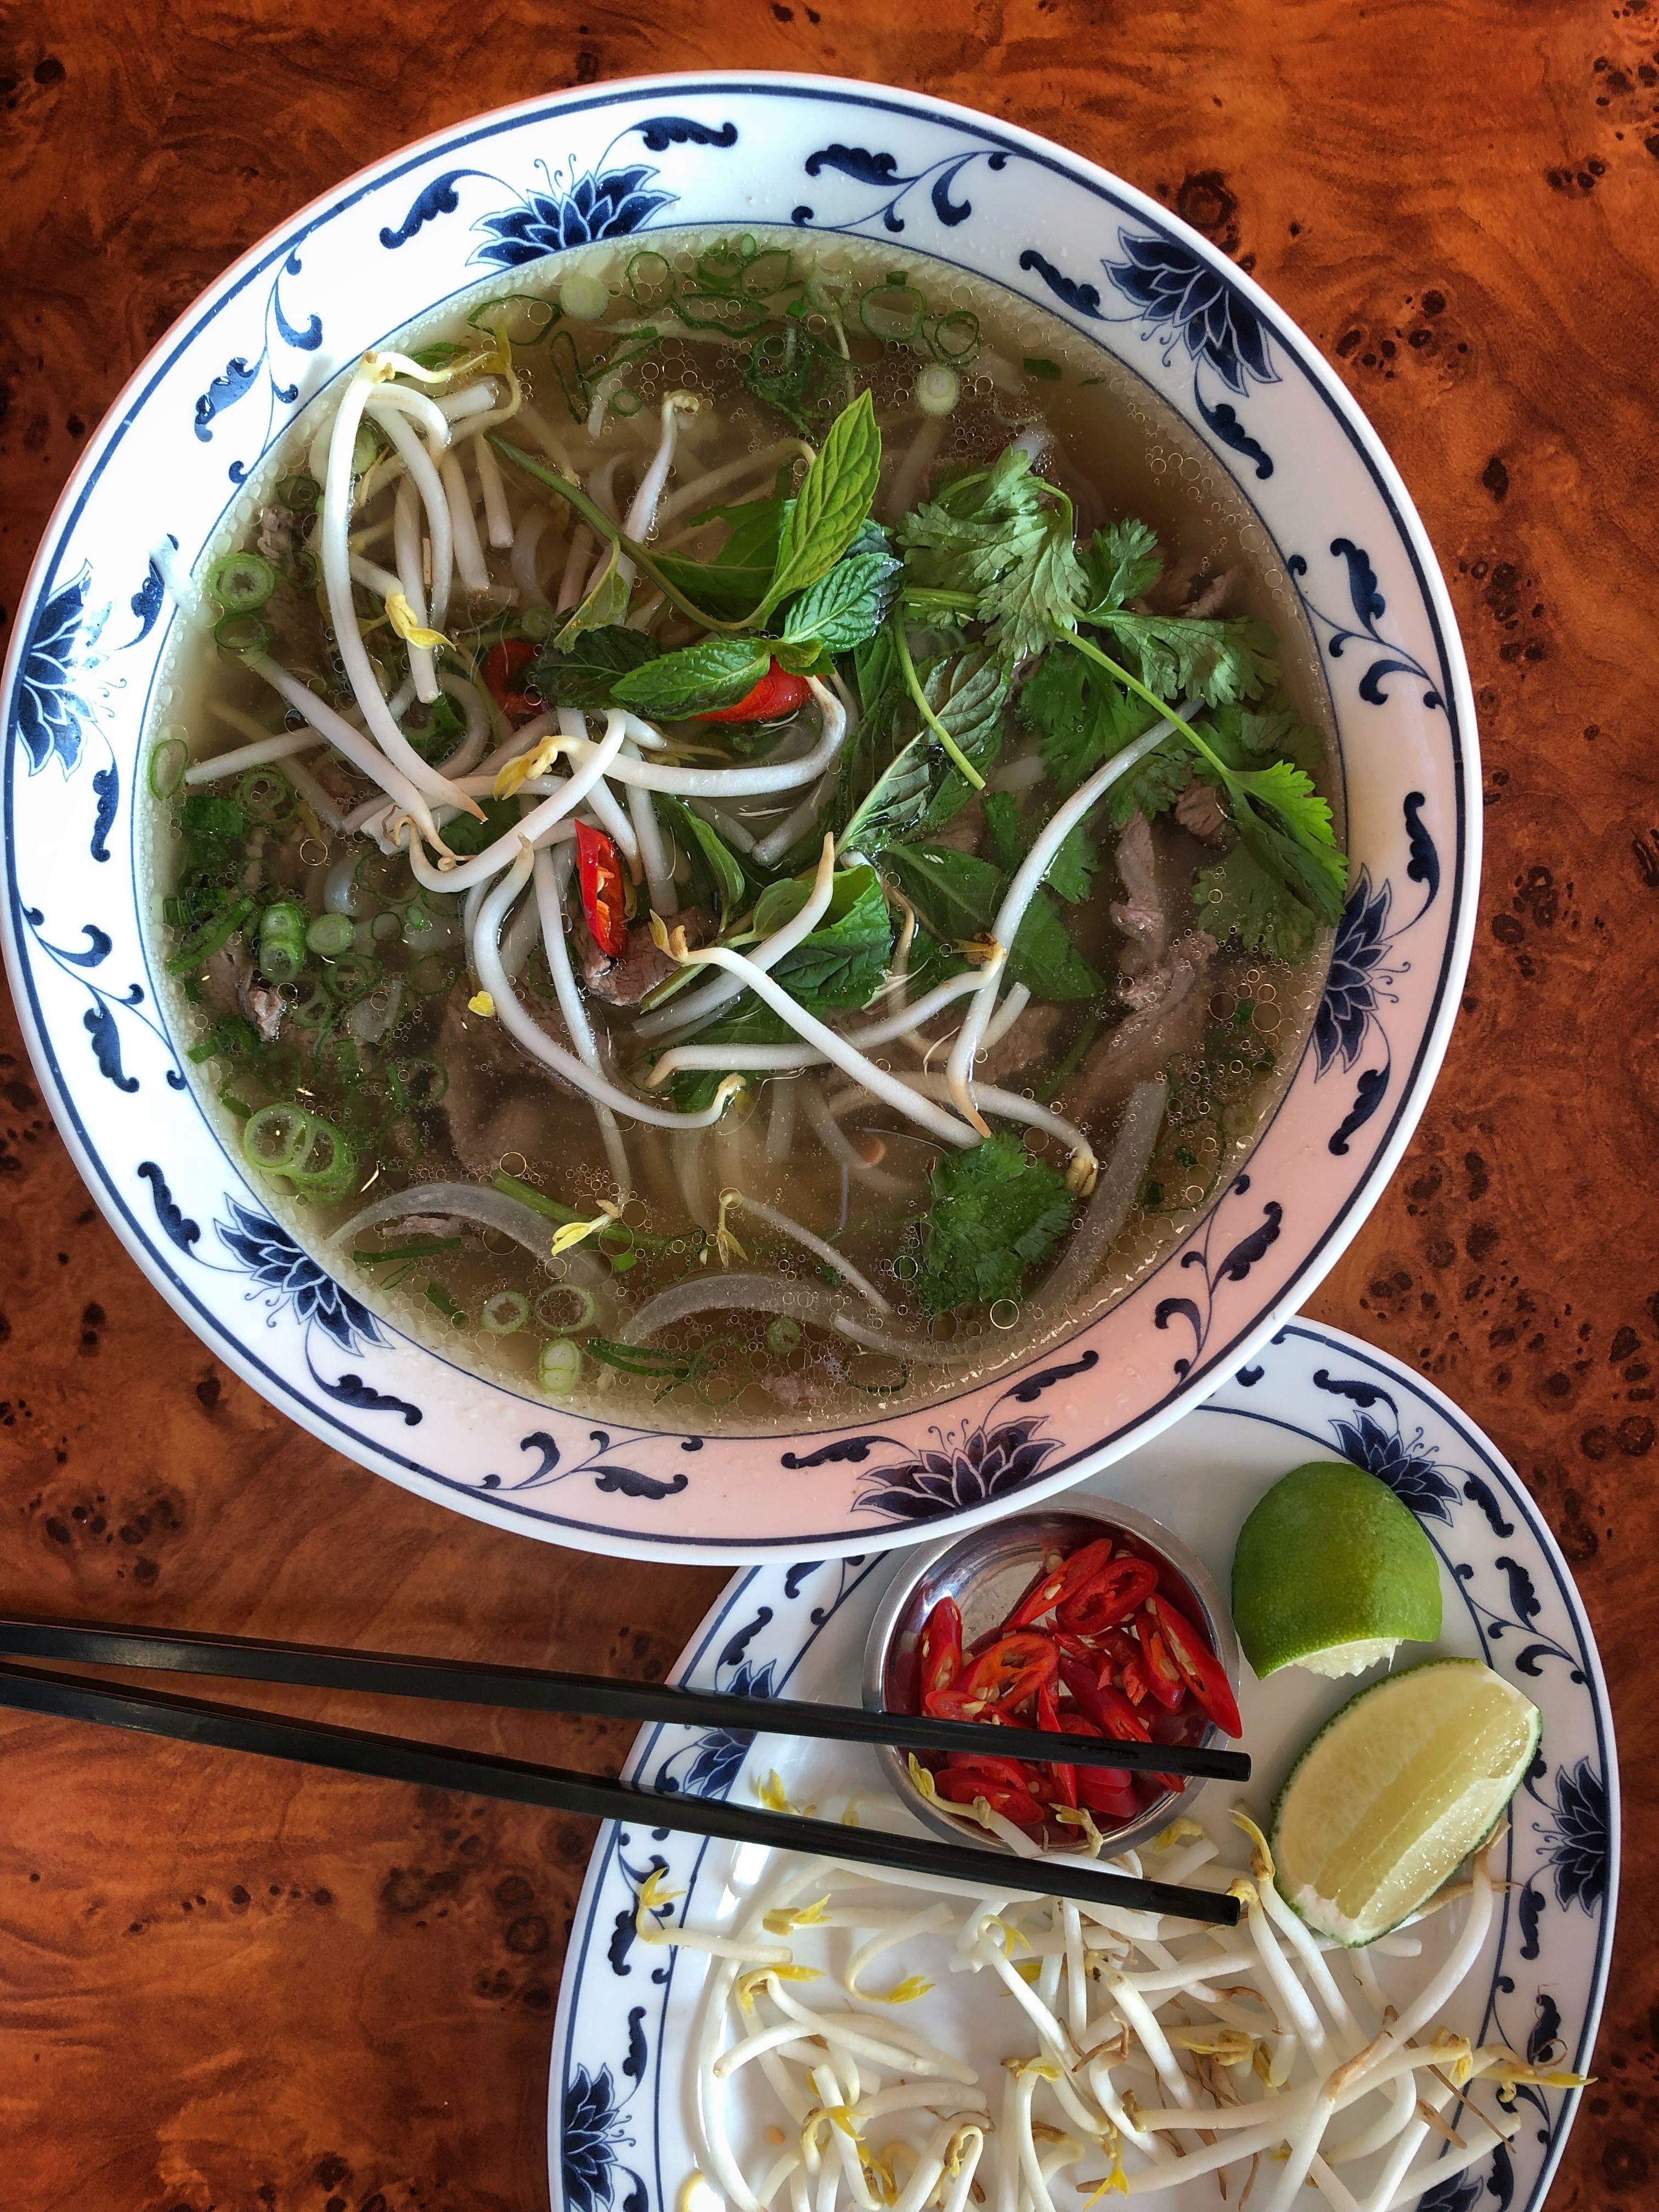 Zupa Pho Przepis Kuchnia Wietnamska Slodkokwasny Com Vegetarian Recipes Asian Recipes Pho